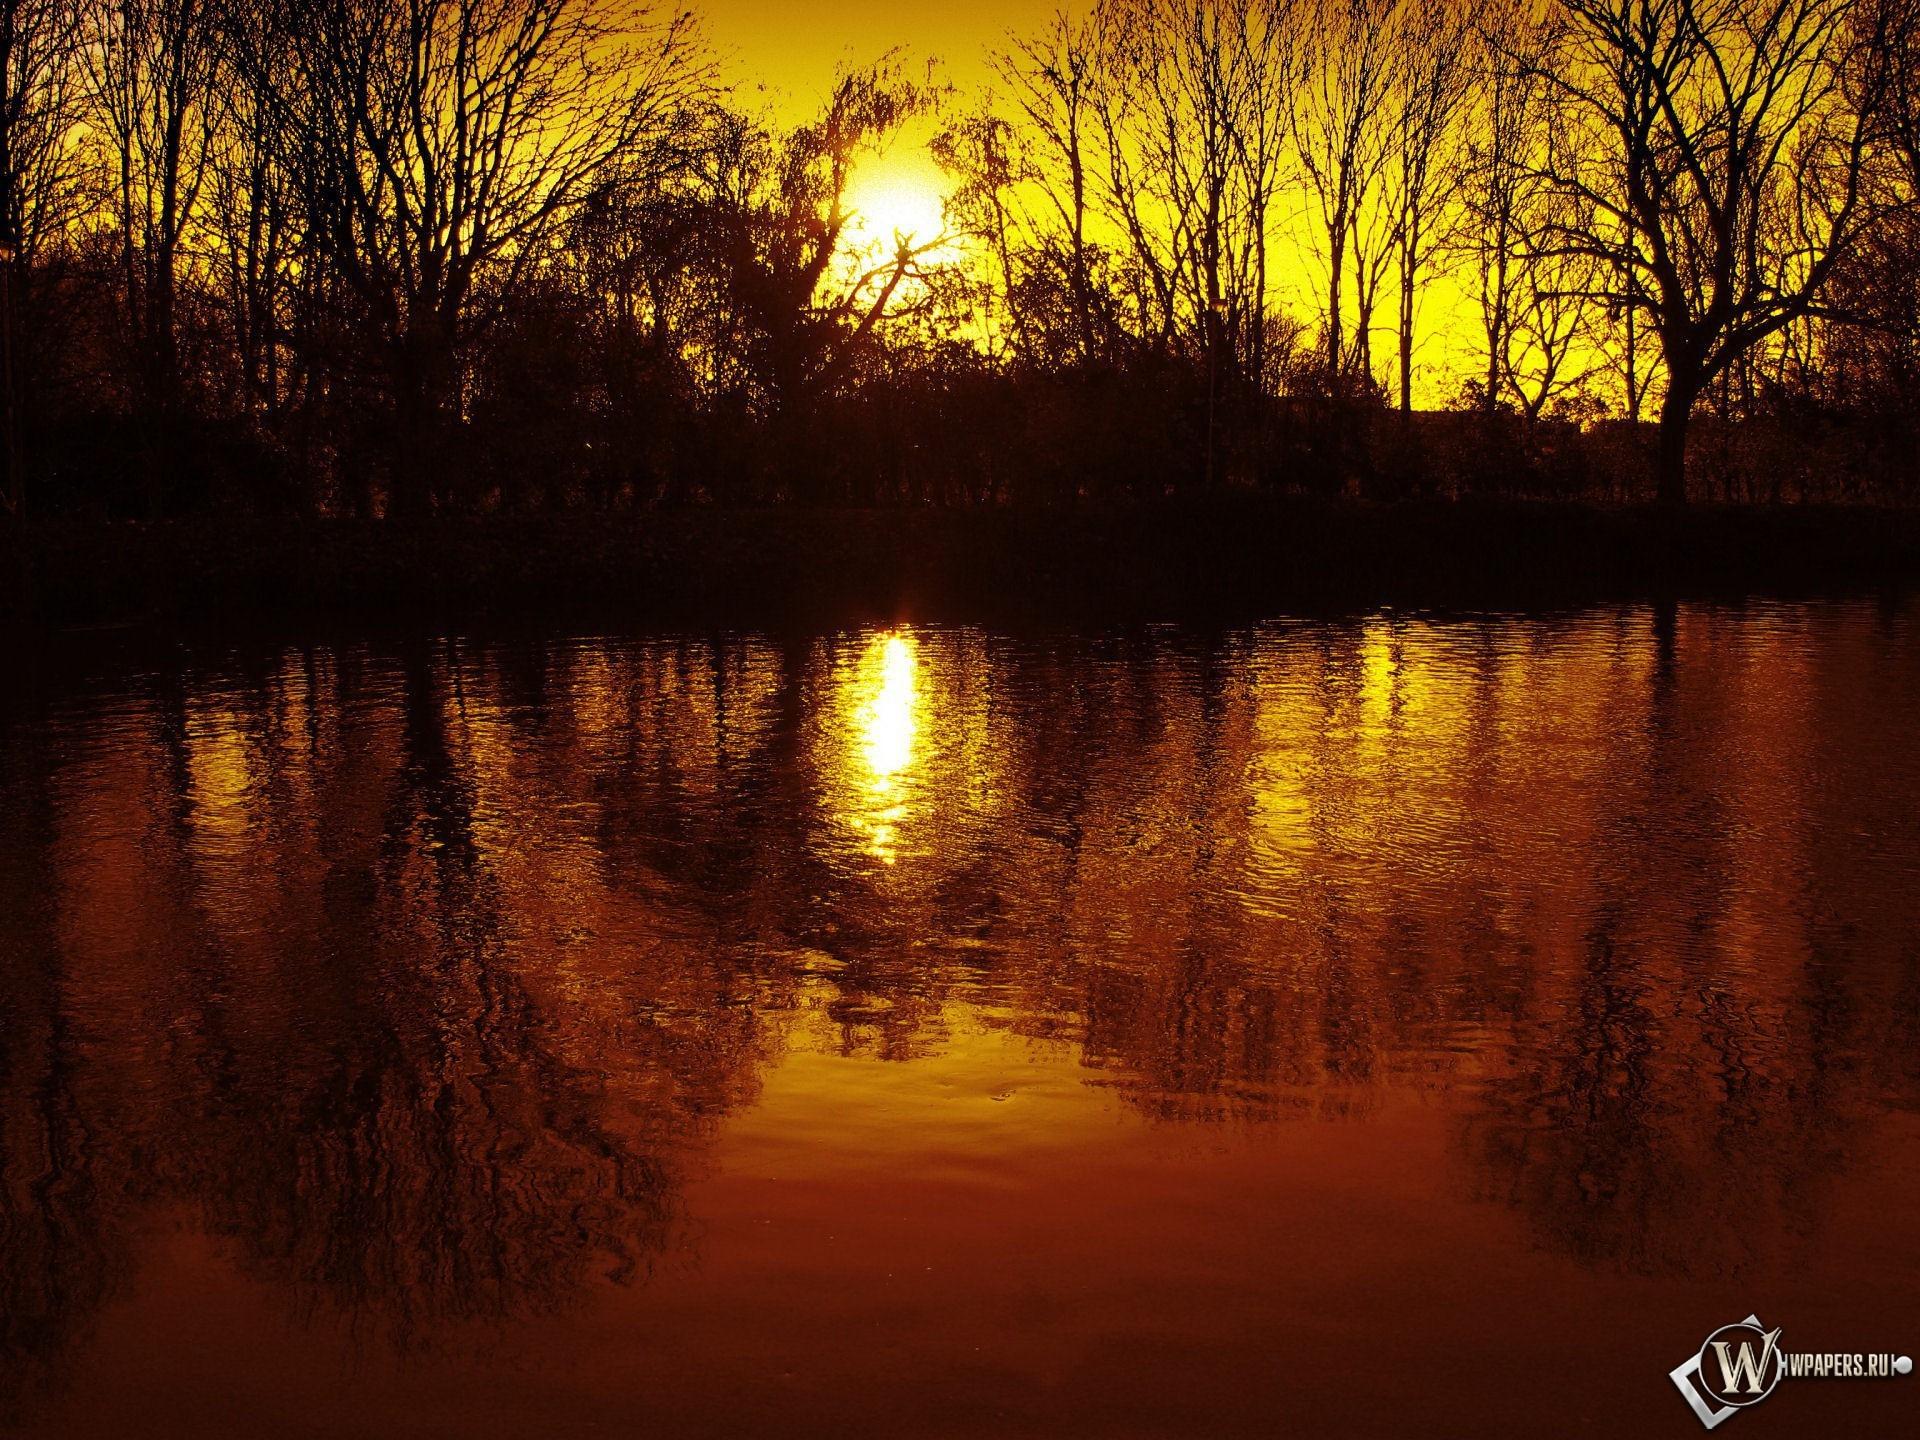 Теплые лучи солнца 1920x1440